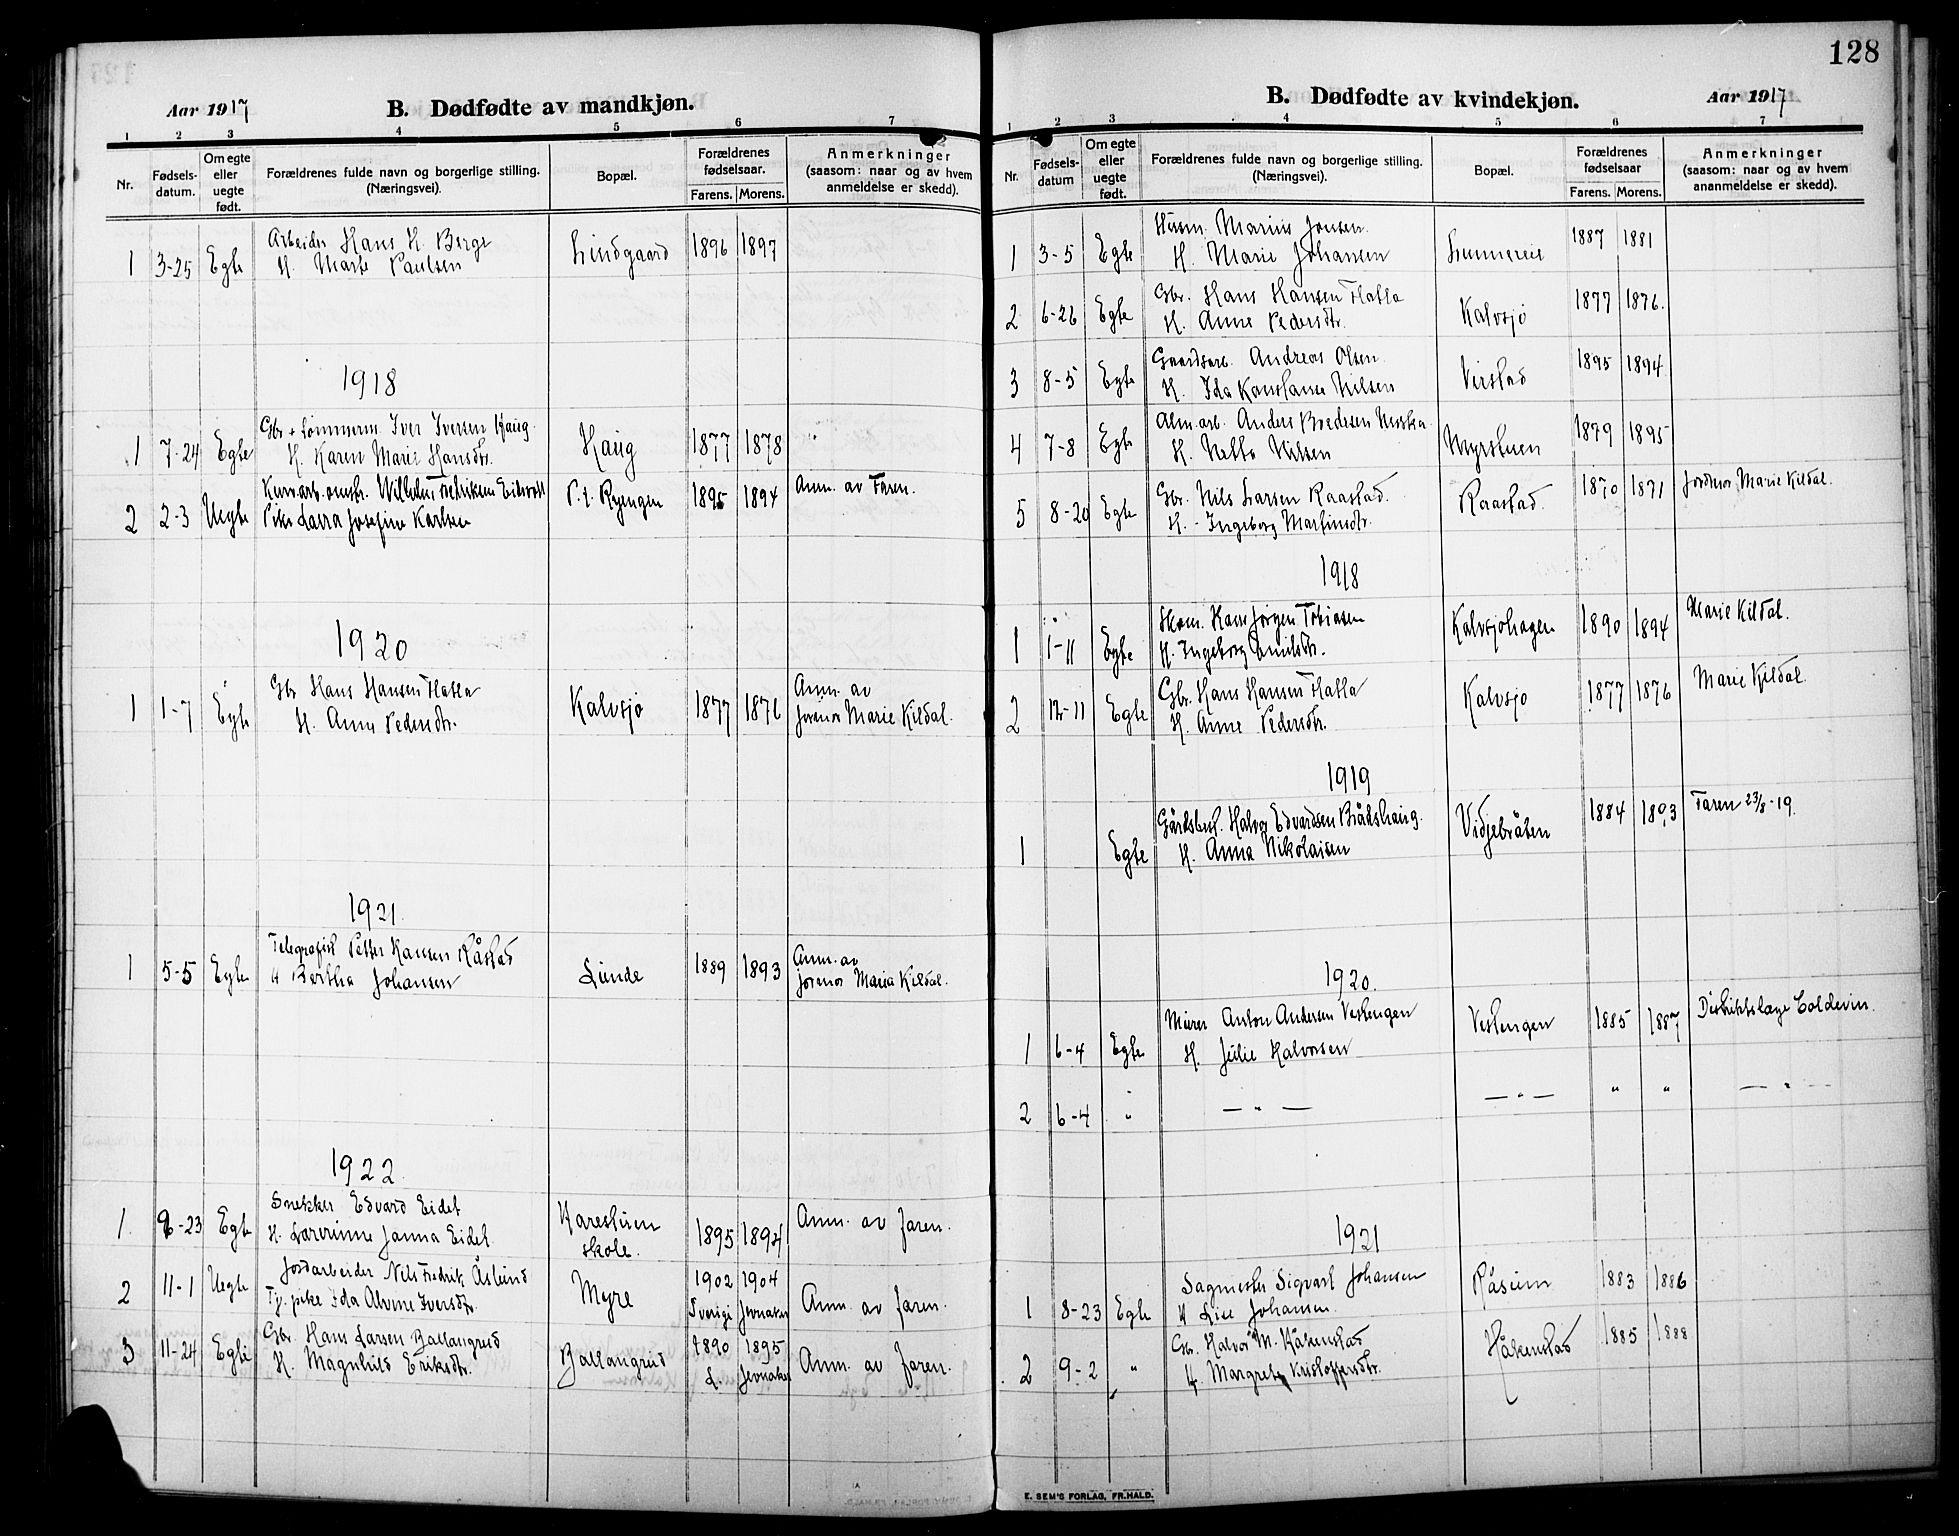 SAH, Lunner prestekontor, H/Ha/Hab/L0001: Klokkerbok nr. 1, 1909-1922, s. 128